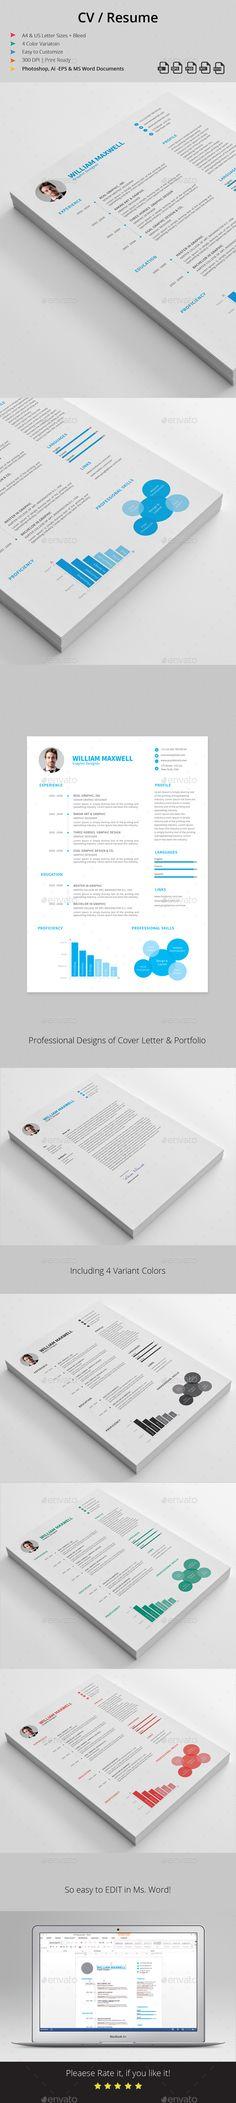 Glory Resume Perfect resume, Resume cv and Cv template - perfect resume template